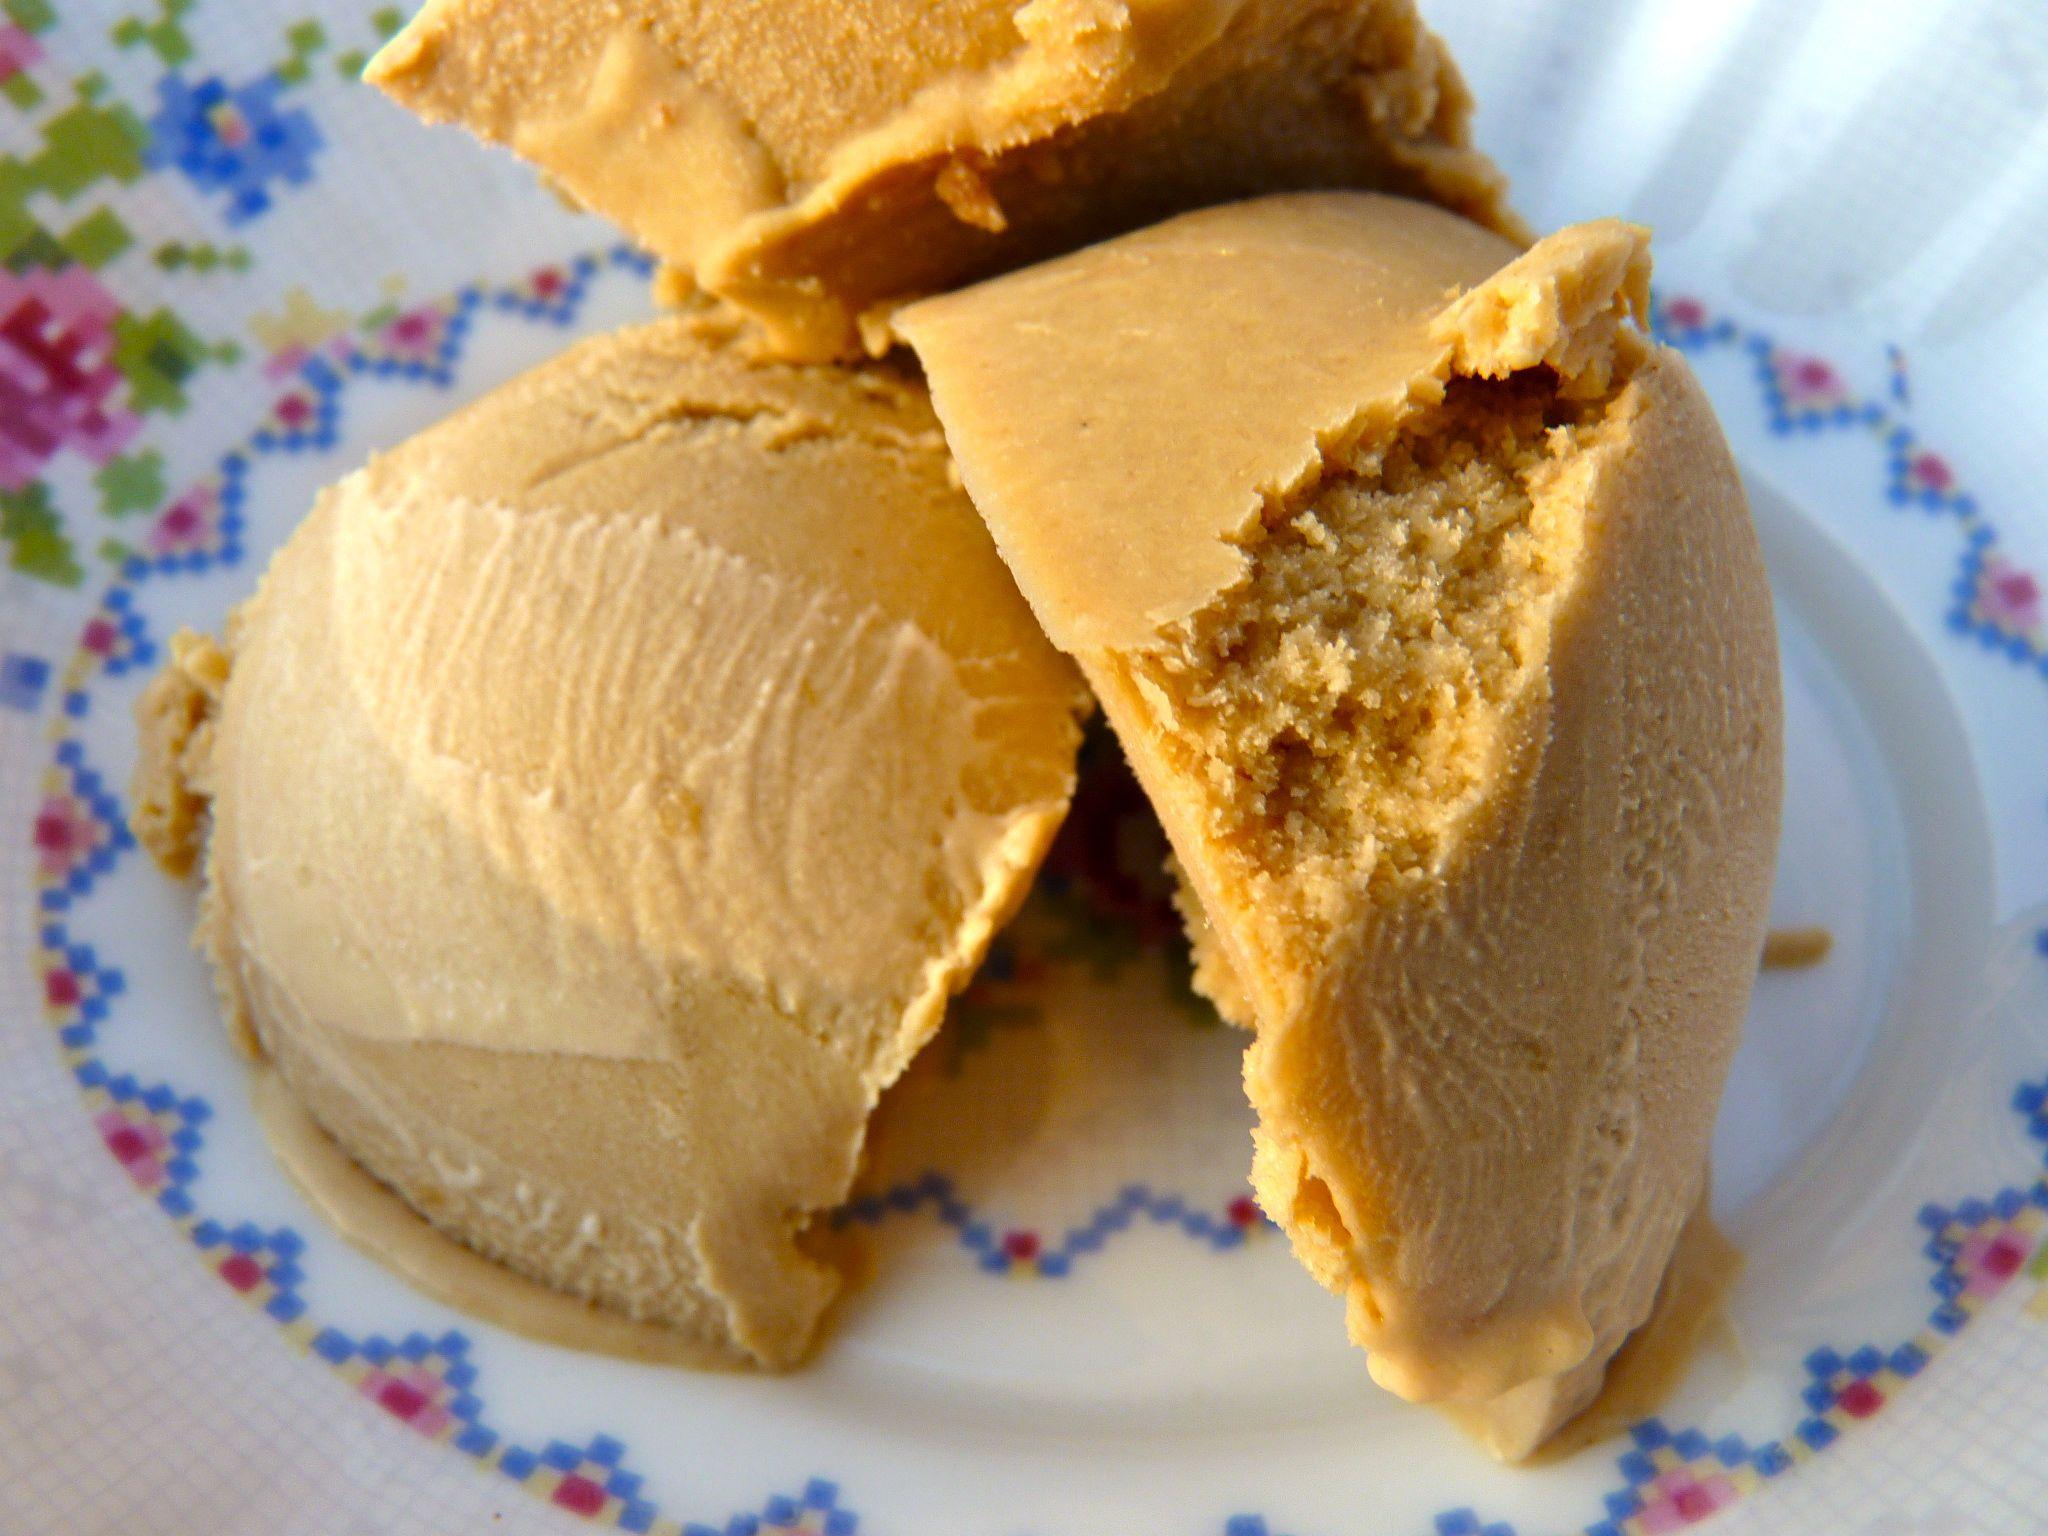 Kahlua Iced Coffee And Vanilla Ice Cream Float Recipe ...